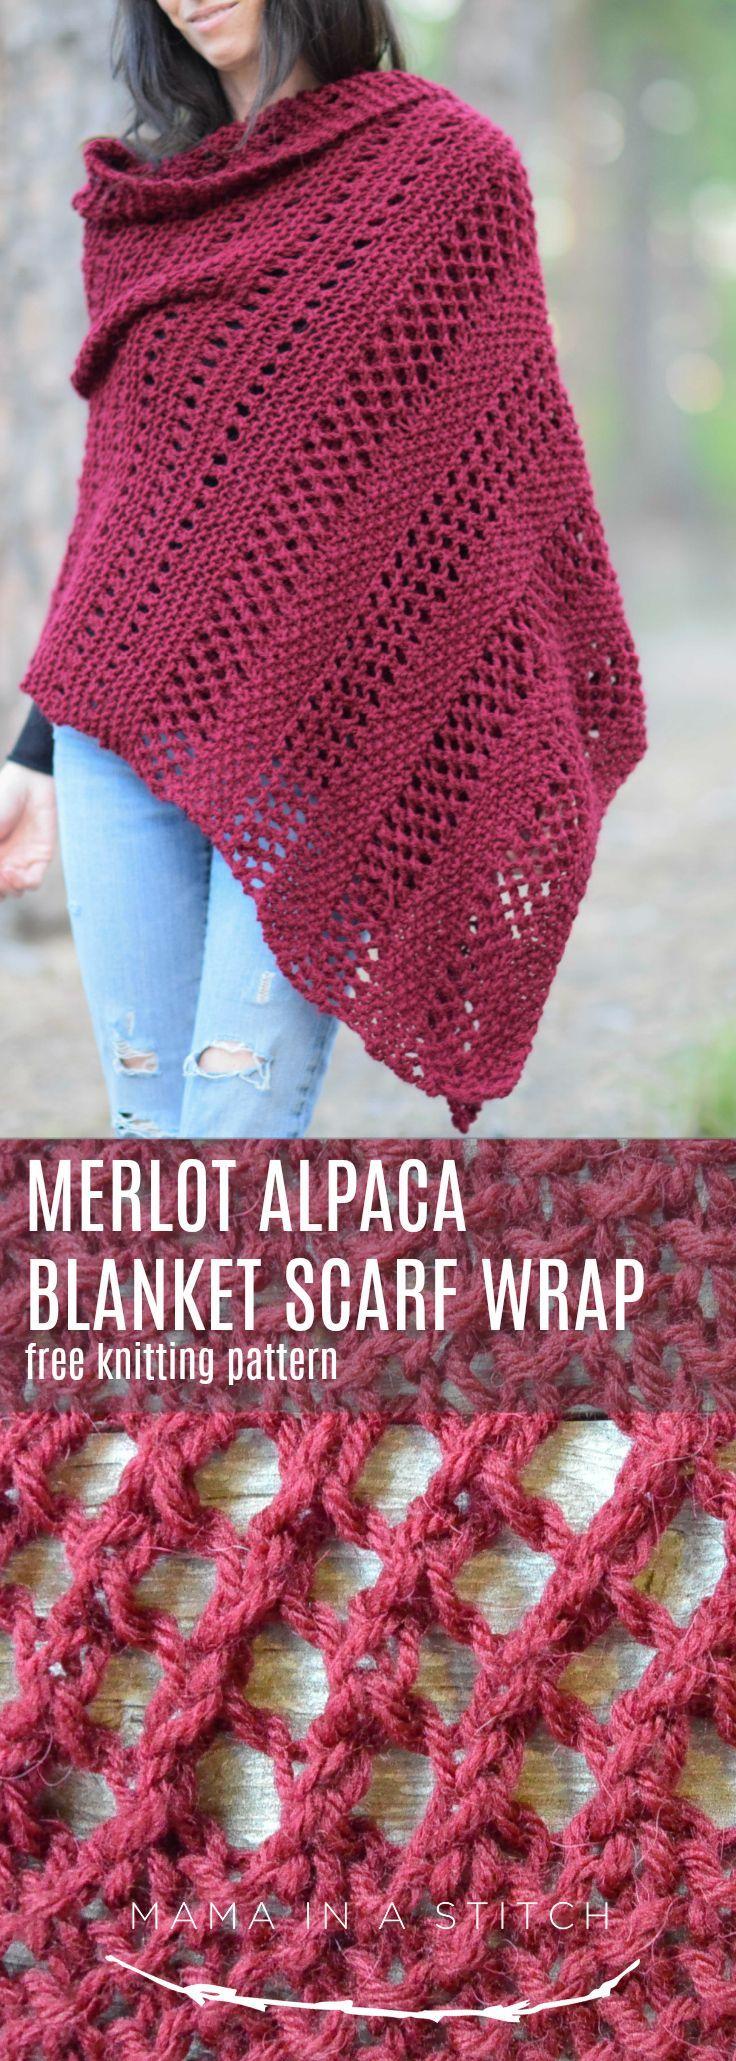 Merlot Alpaca Wrap Shawl Knitting Pattern via Mama In A Stitch Knit and Crochet …